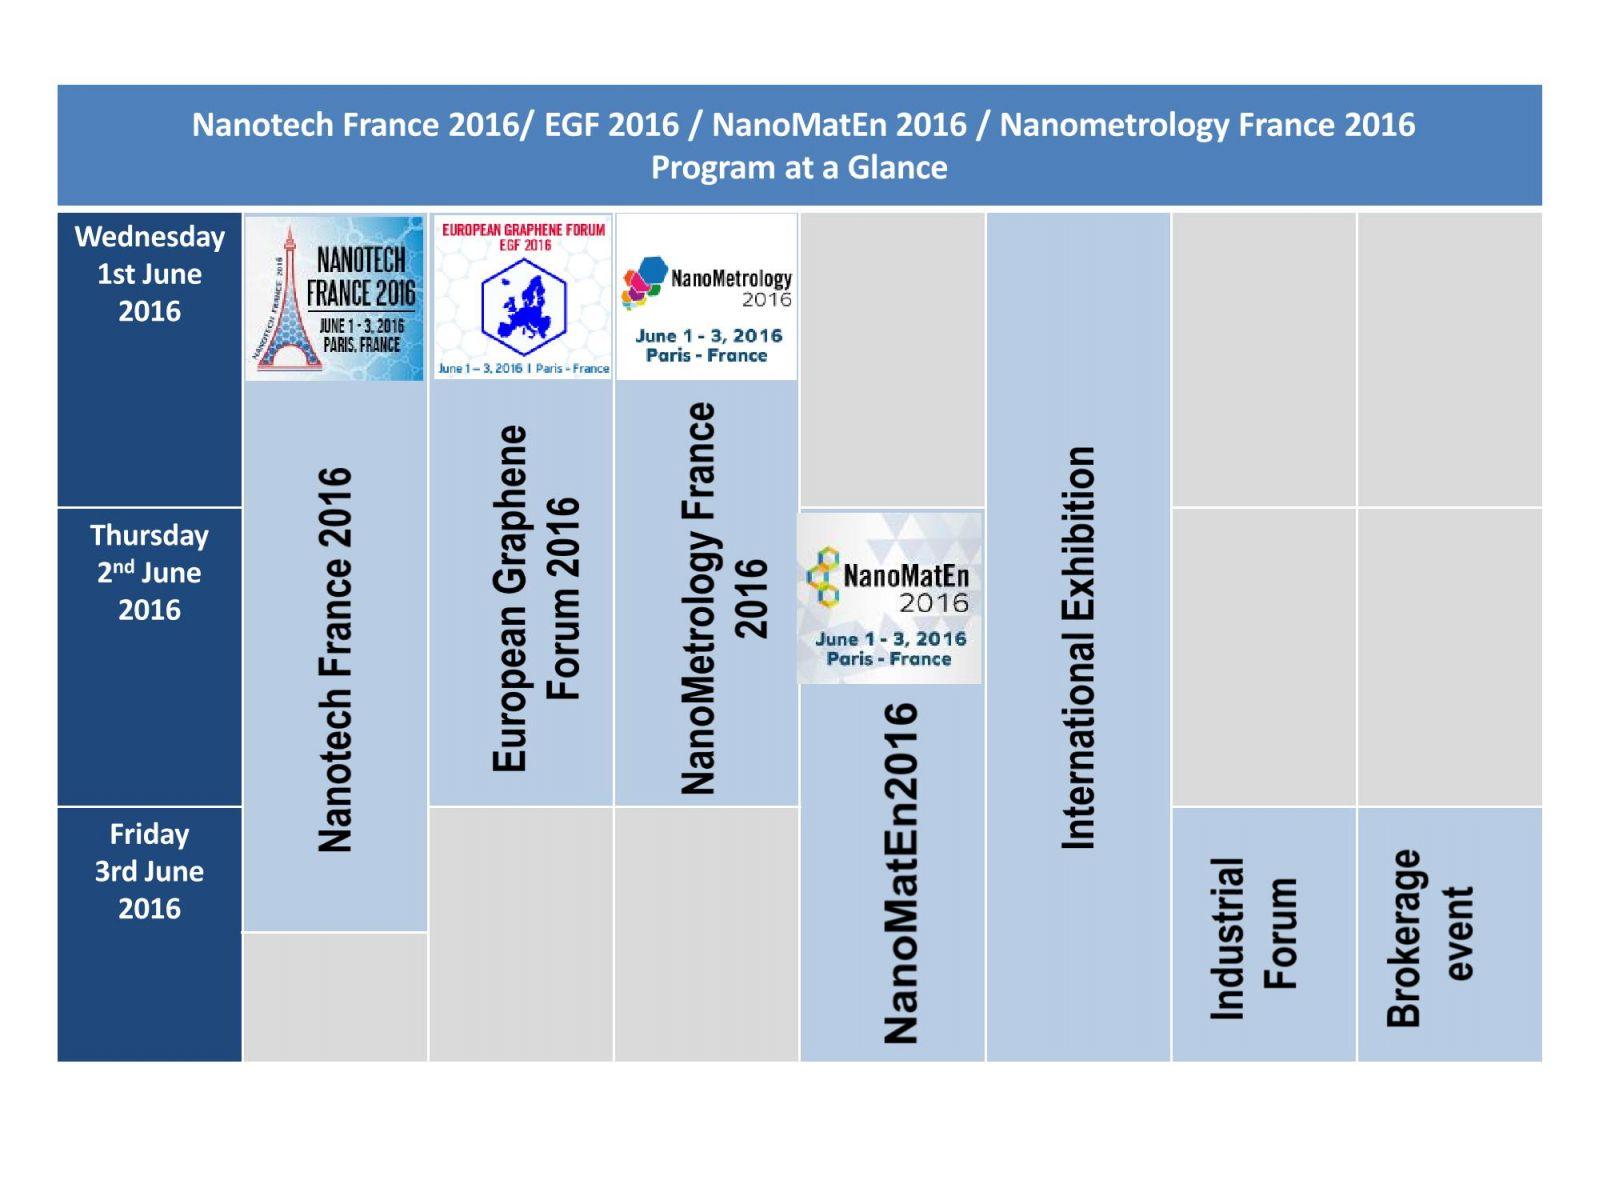 France Nano 4 in 1 Event